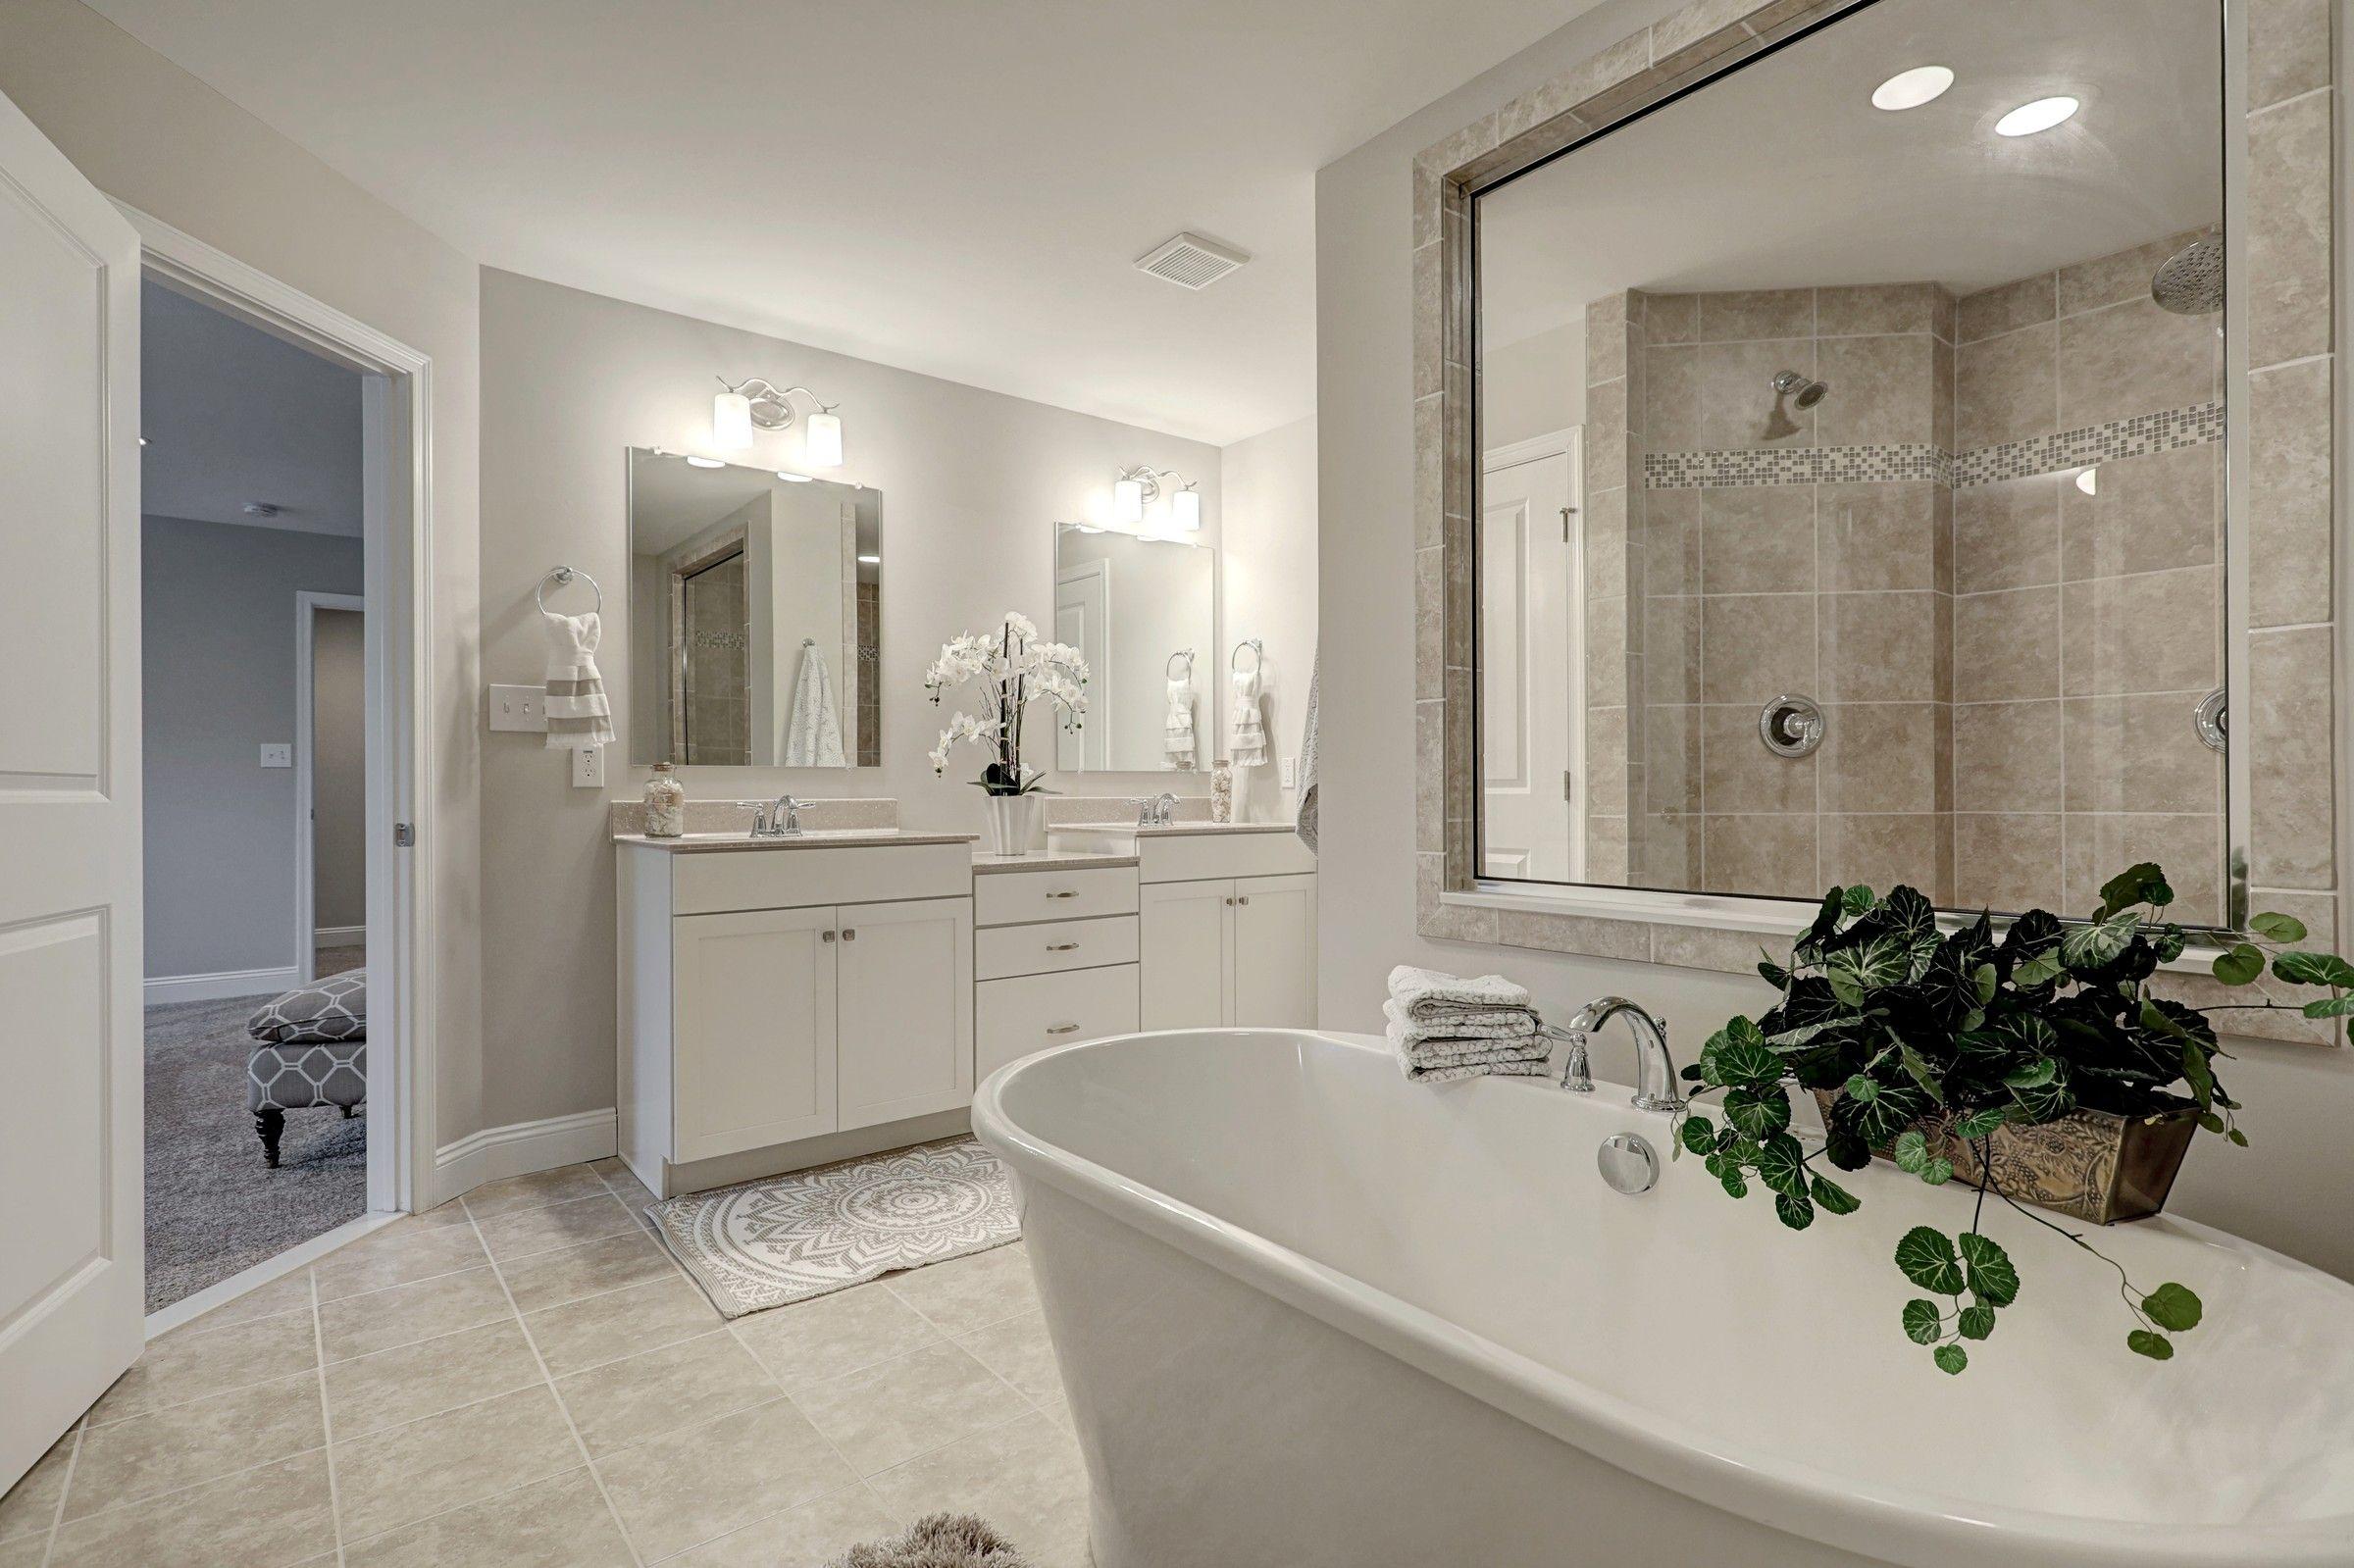 Bathroom featured in the Oxford Farmhouse By Keystone Custom Homes in Wilmington-Newark, MD